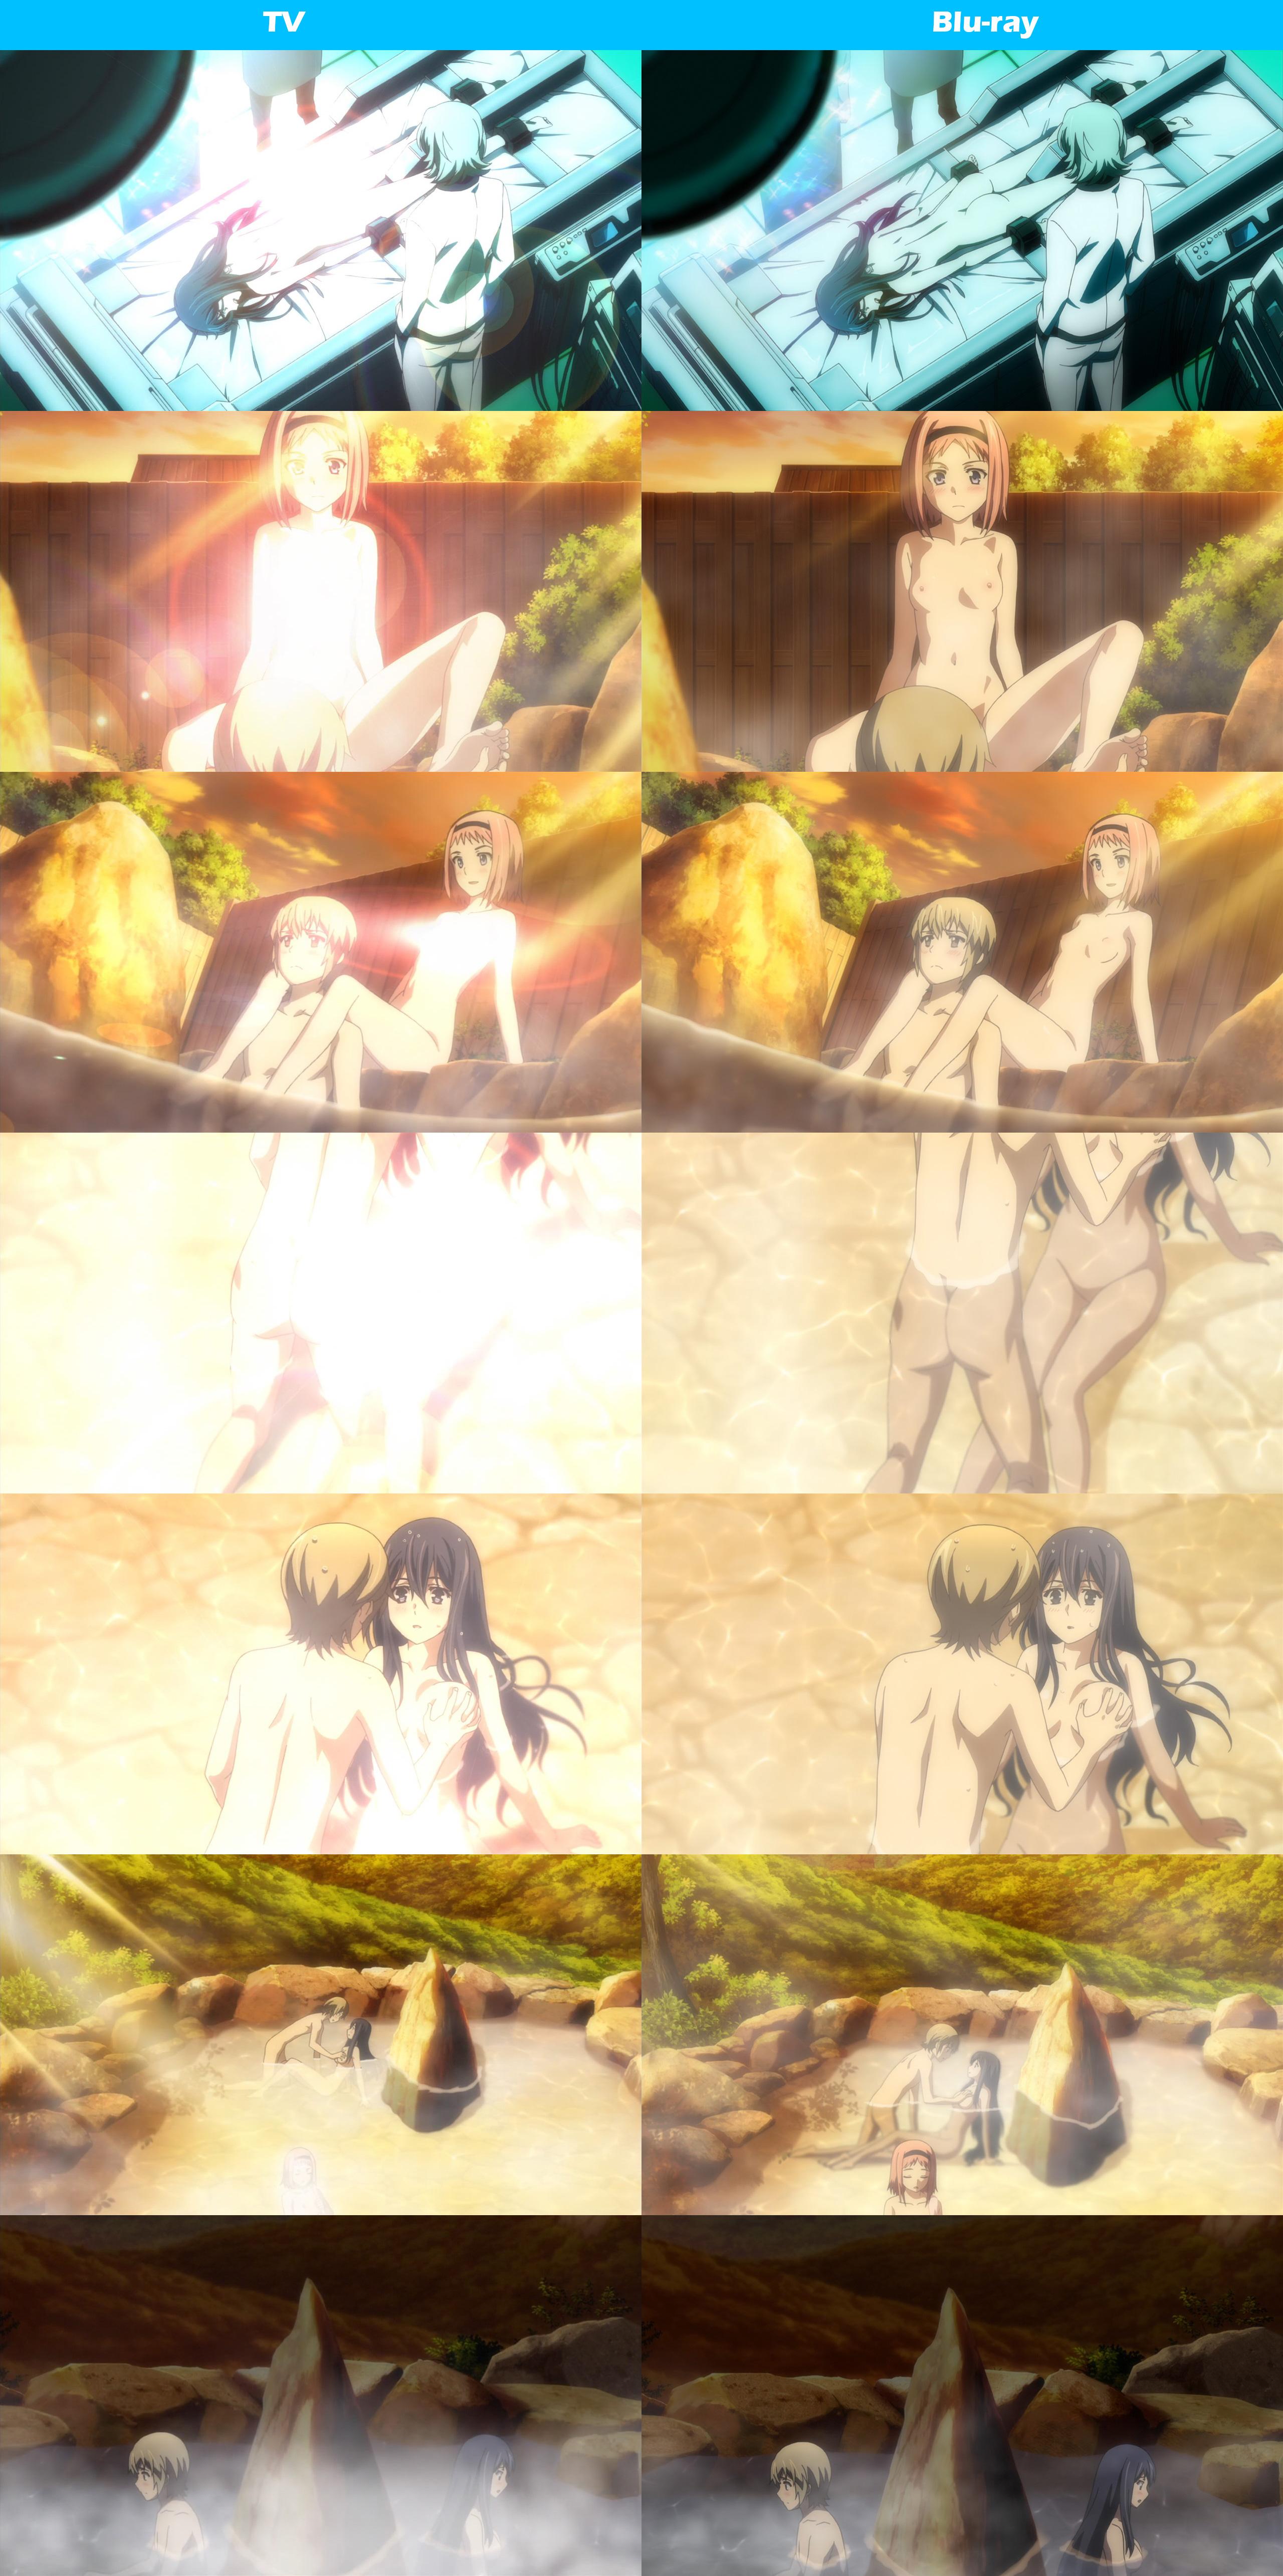 Gokukoku-no-Brynhildr-TV-and-Blu-ray-Comparisons-Nudity-1_Haruhichan.com